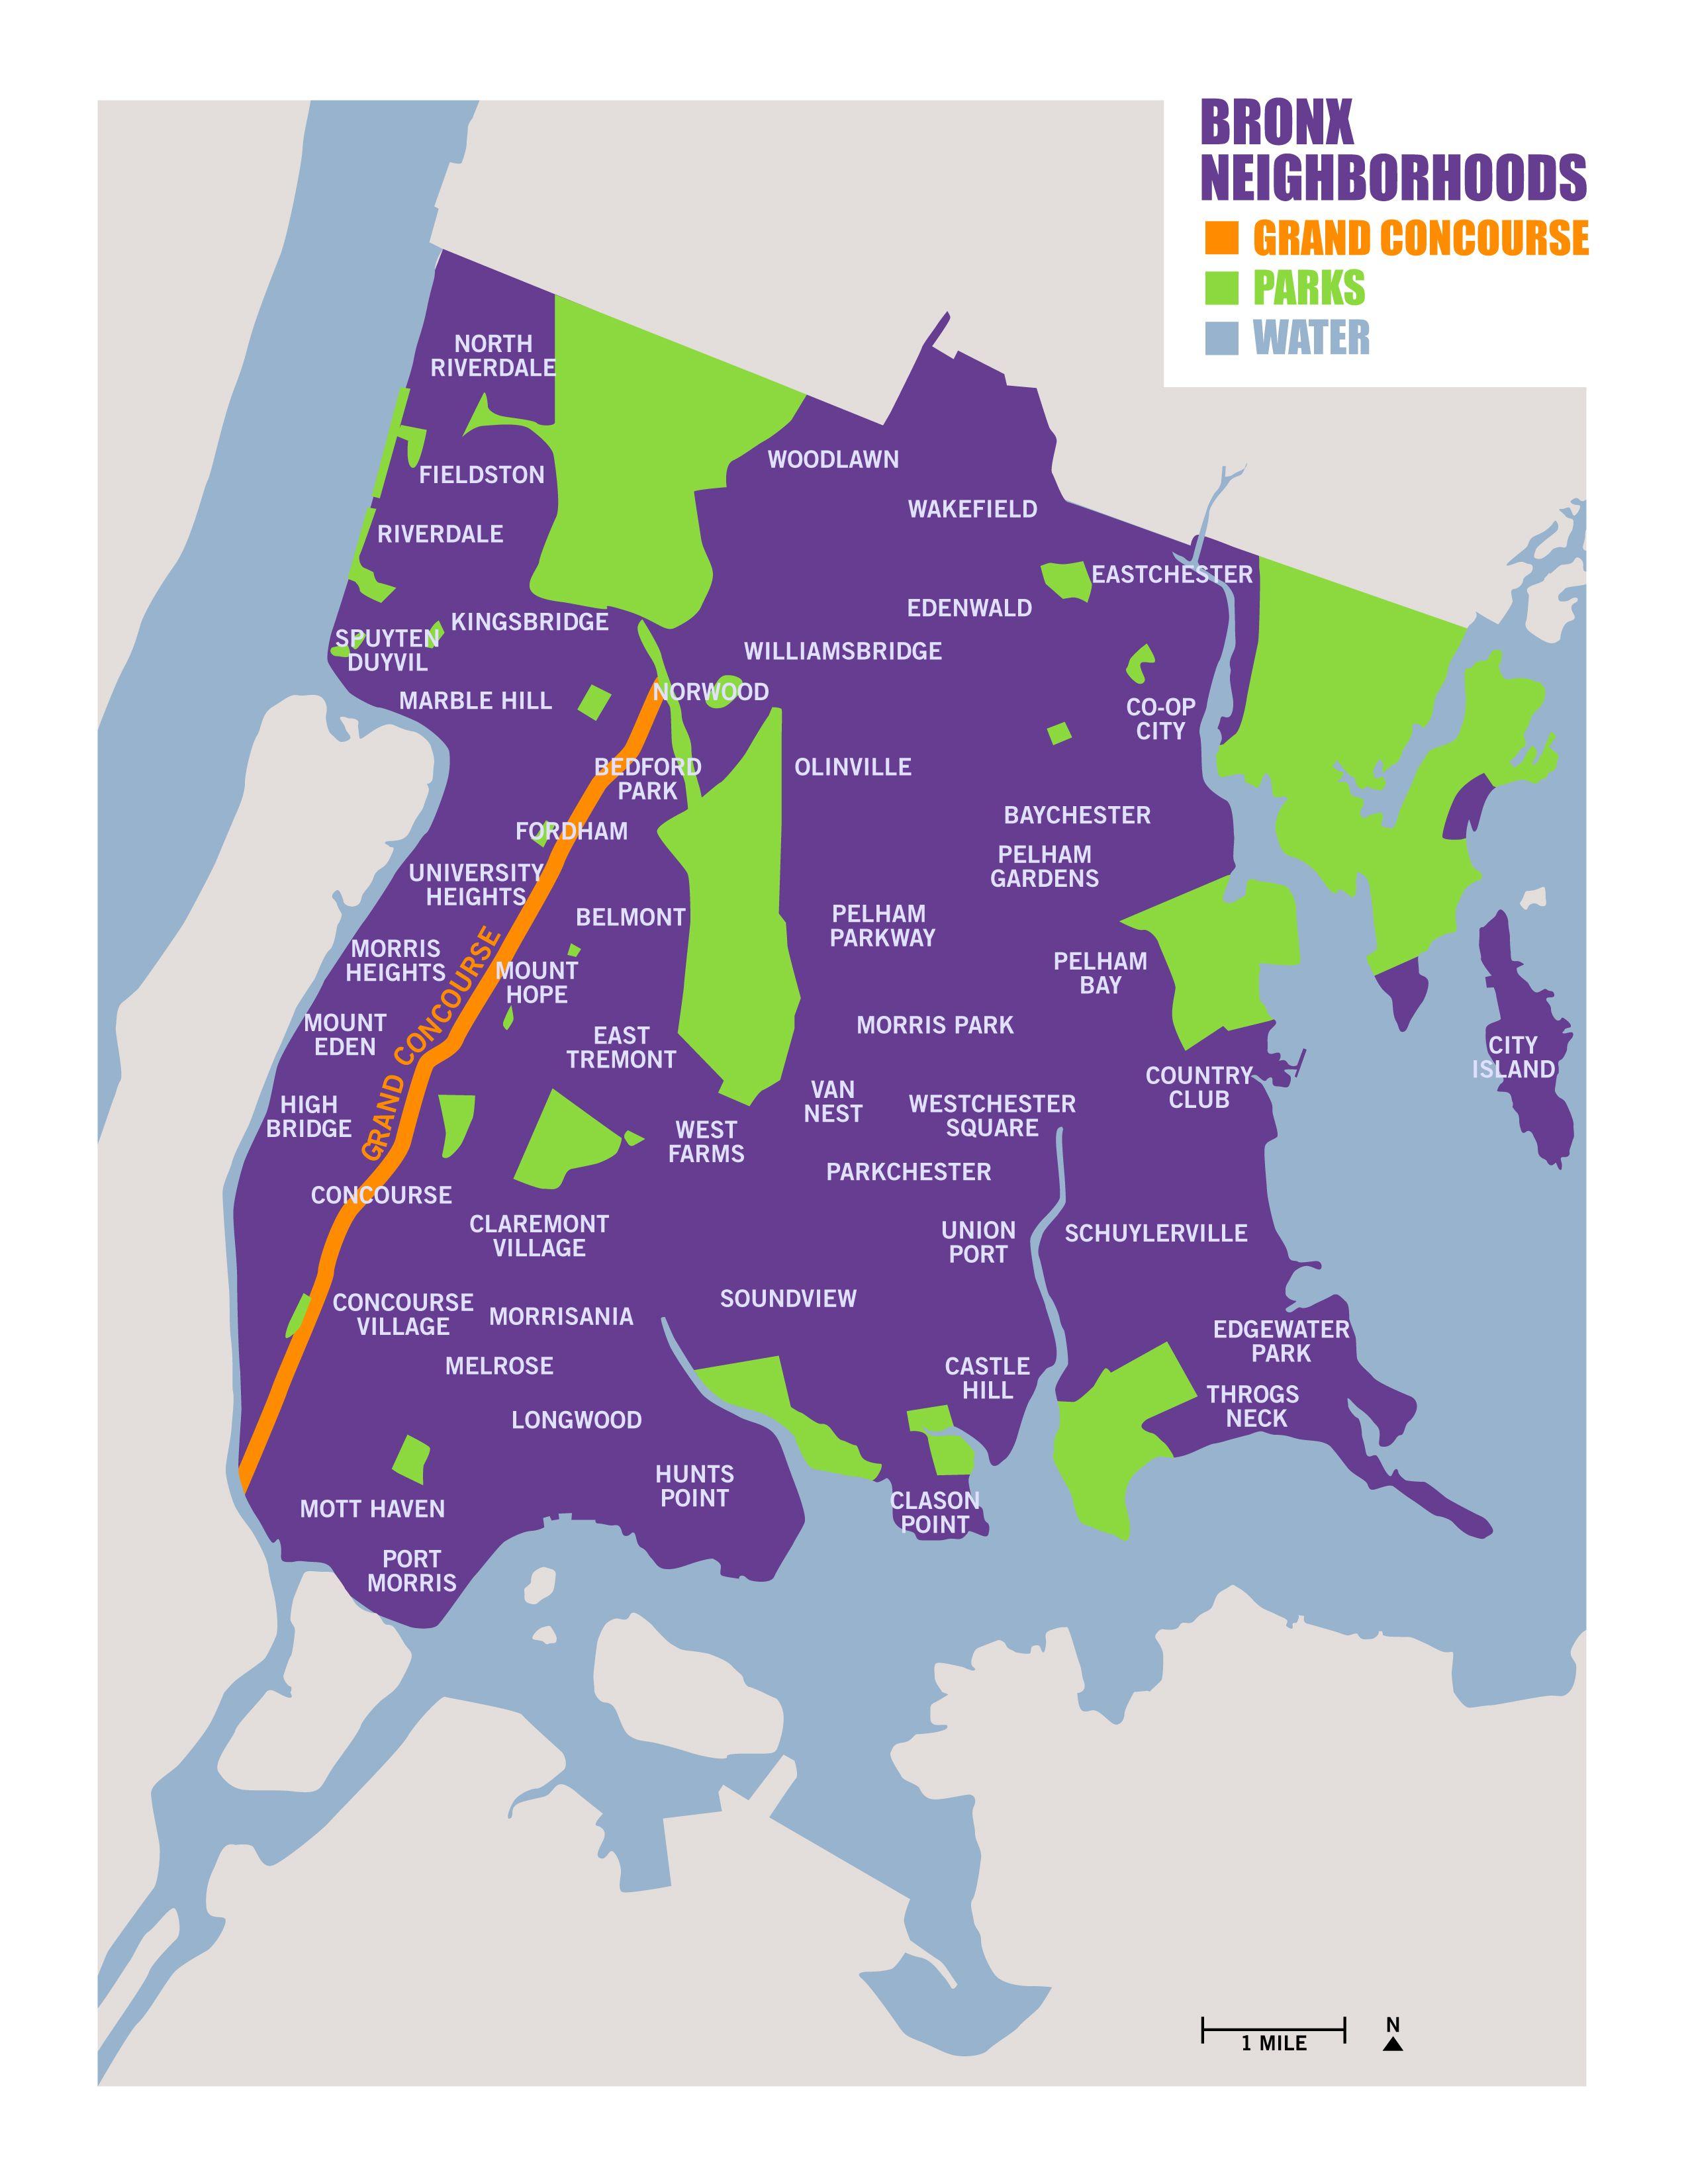 Neighborhoods Parks And Water Bronx Map Bronx The Neighbourhood